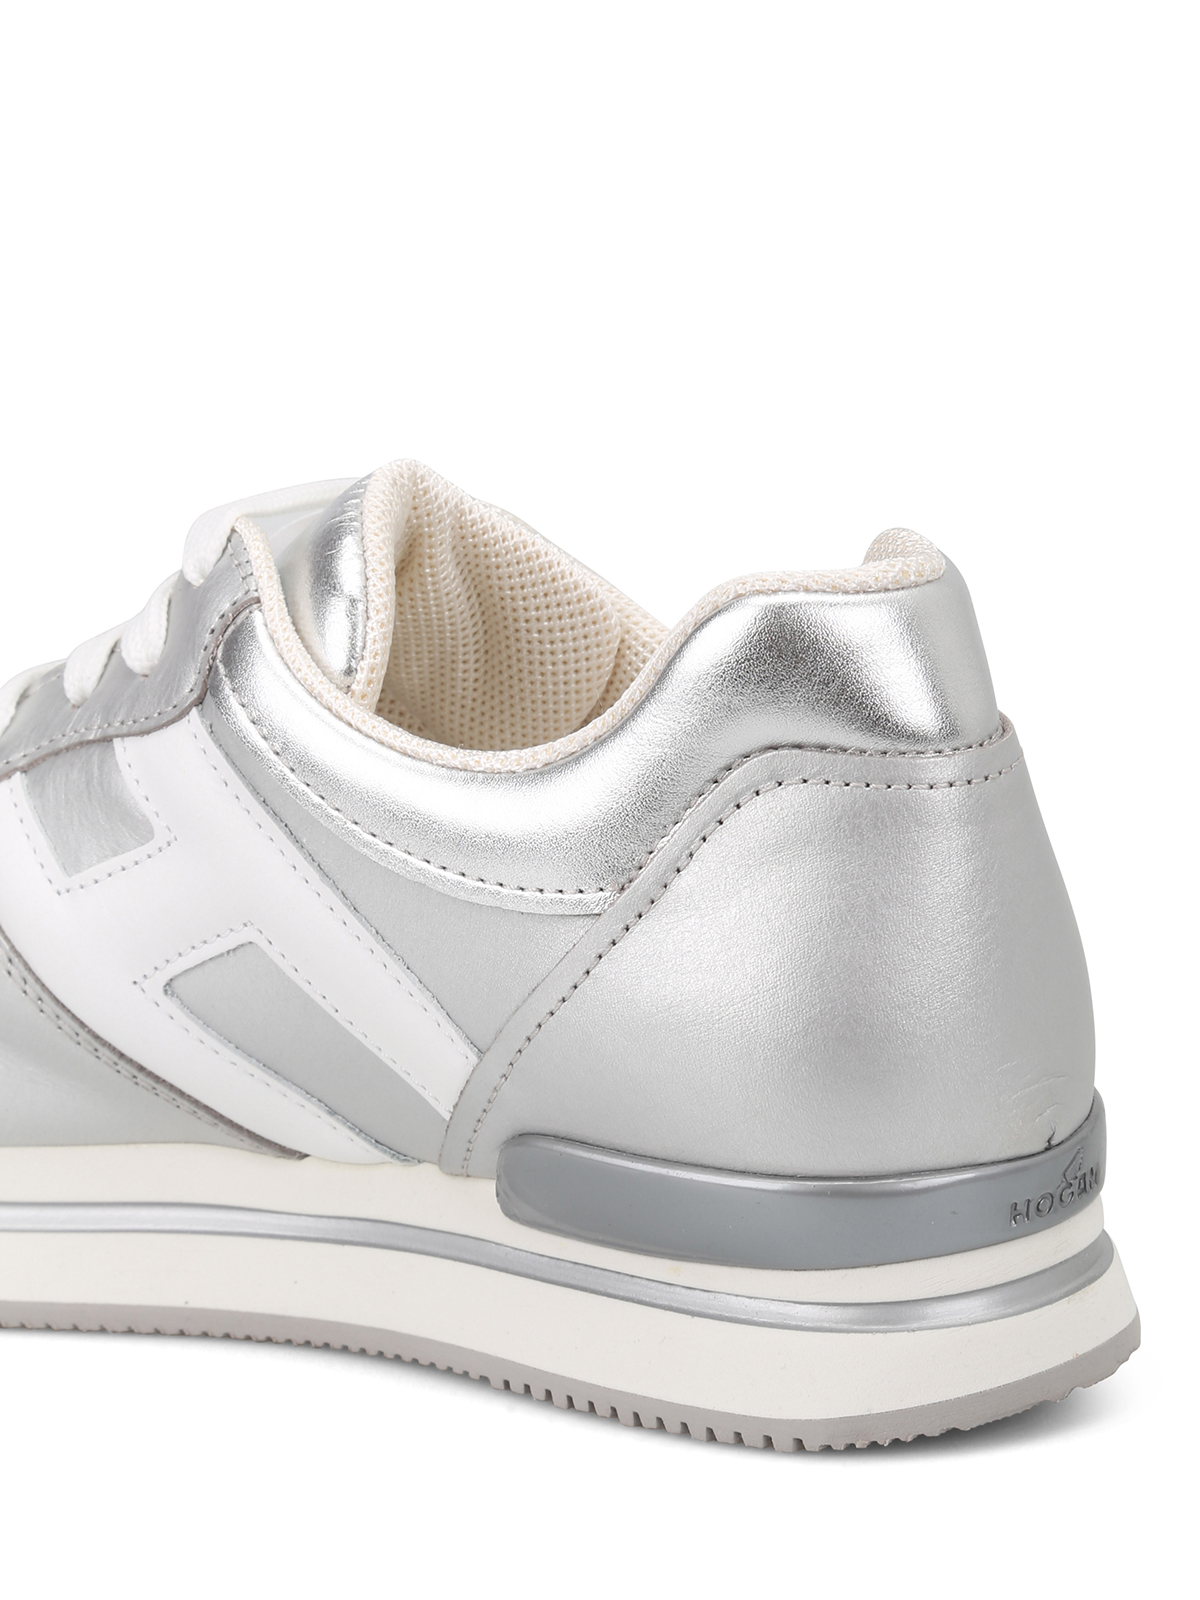 Sneakers Hogan - Sneaker H222 argento e bianche - HXW2220T548I8G0906